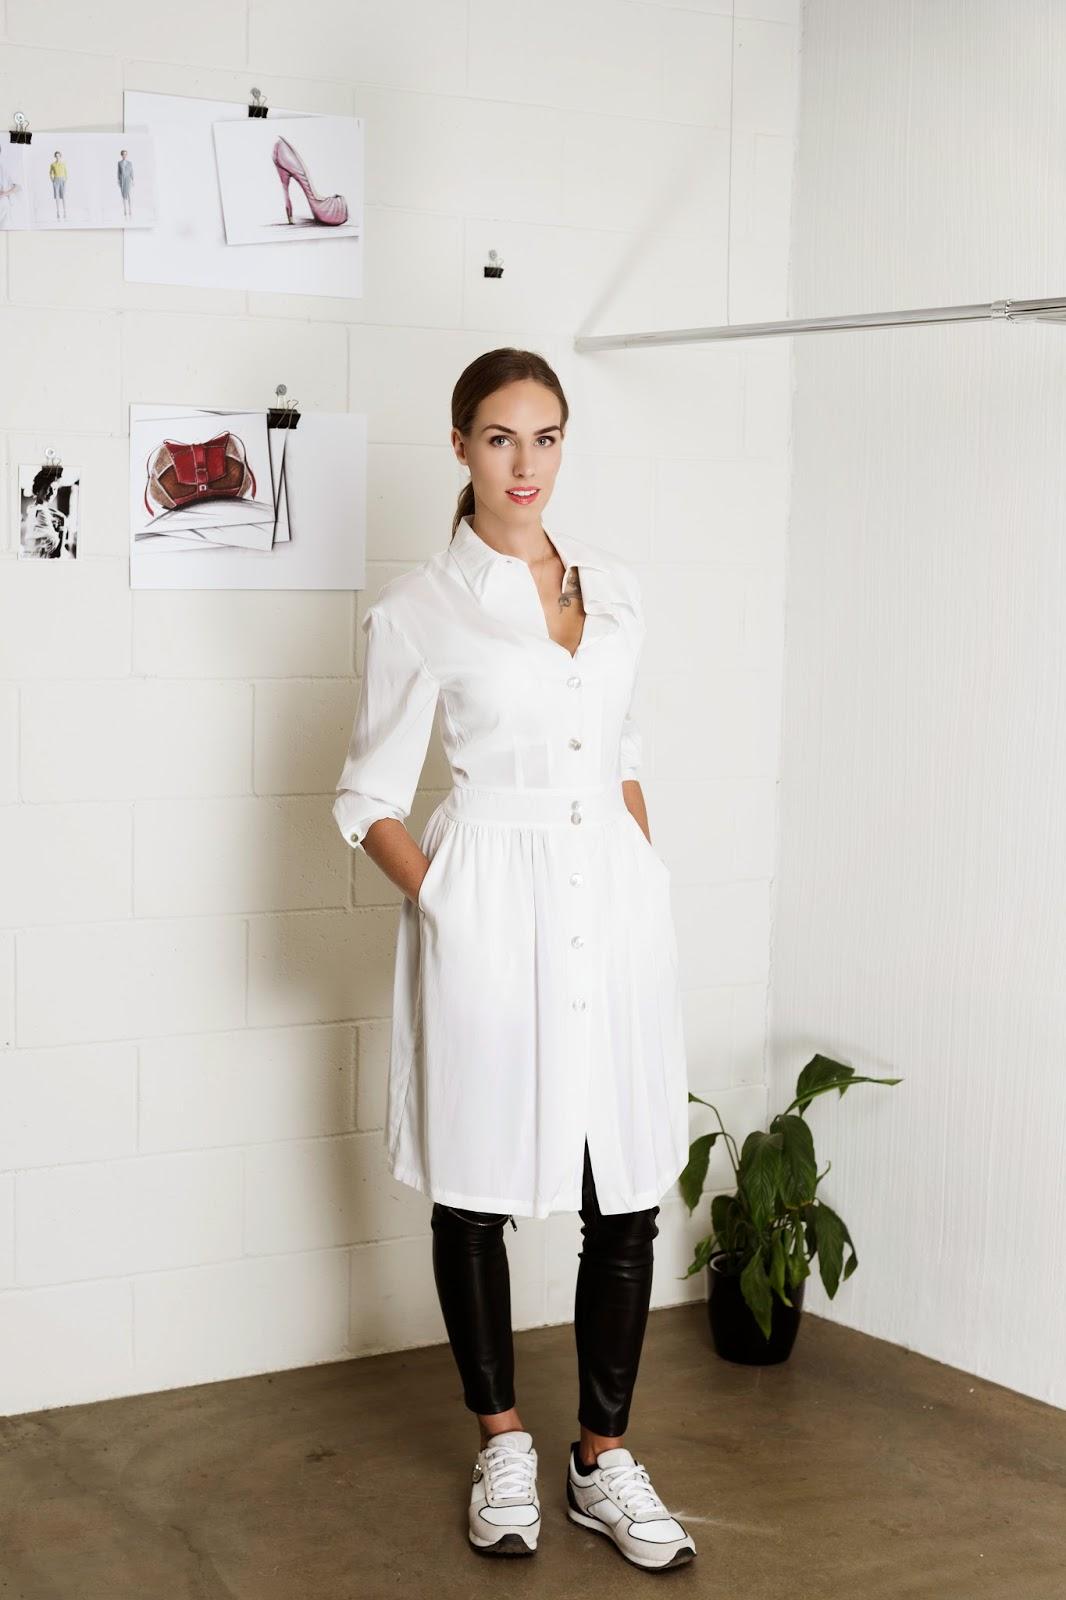 kristjaana mere zero popup store enia joost white dress